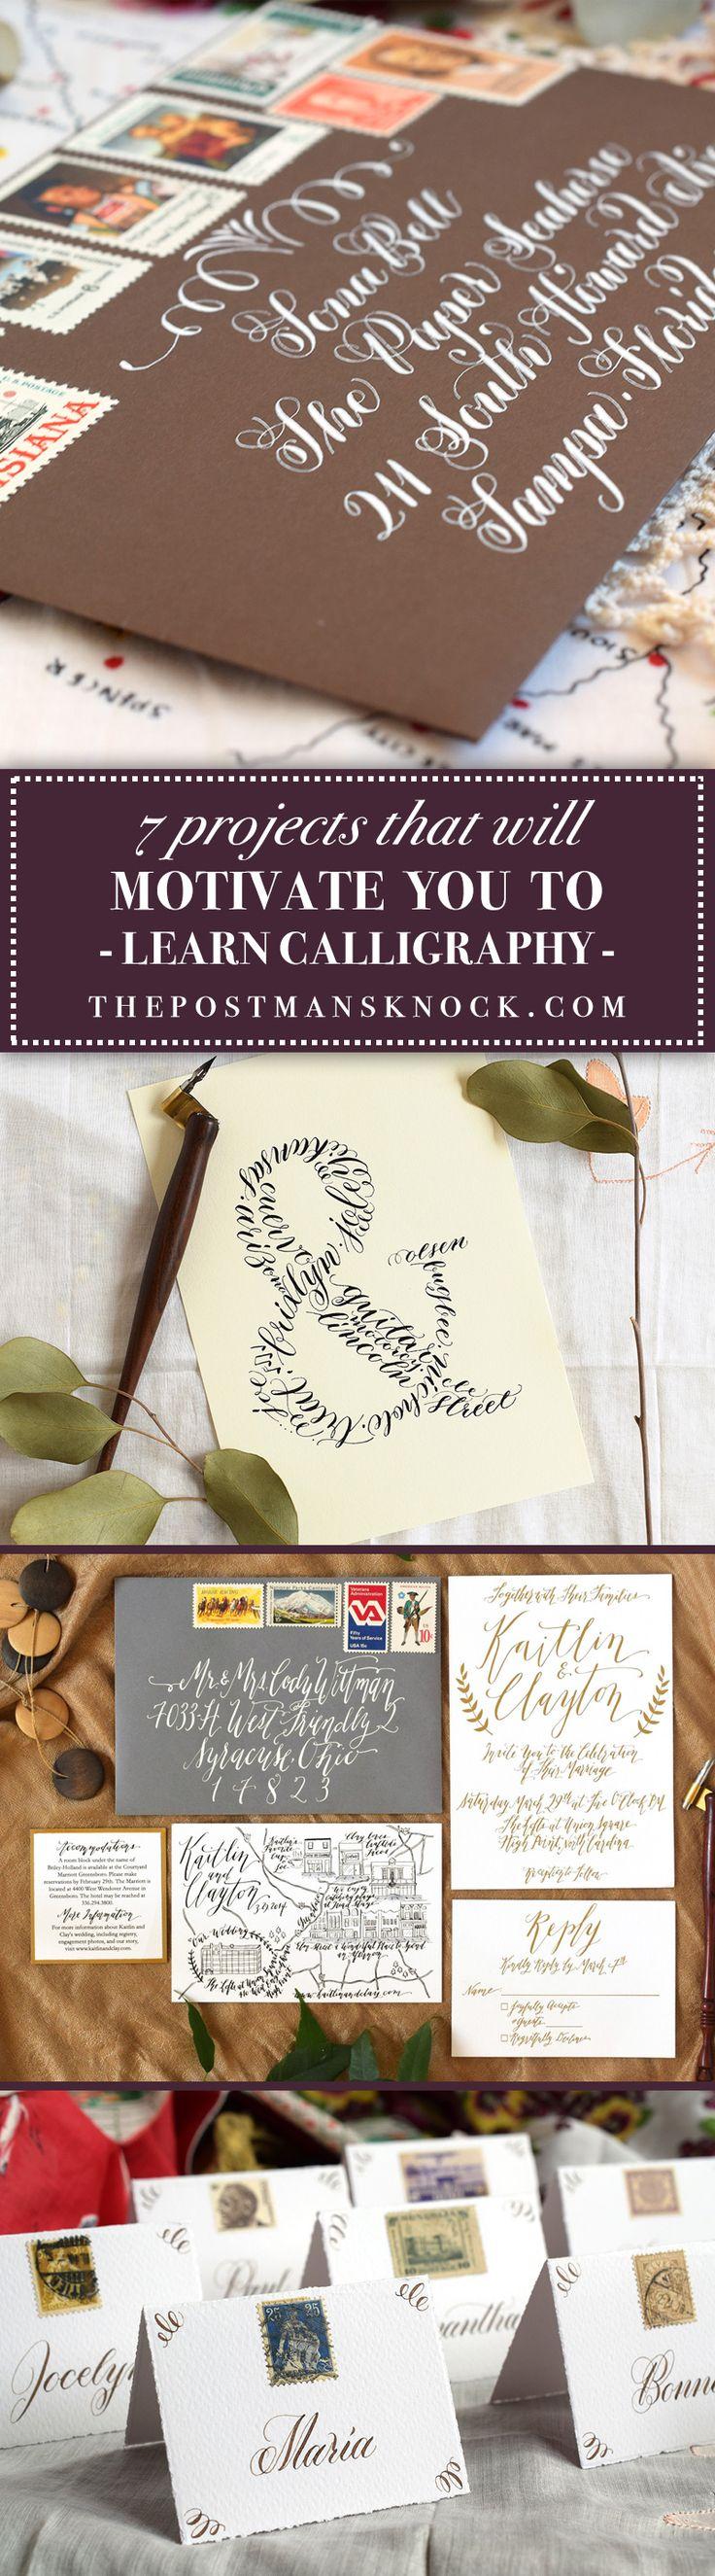 best 25 calligraphy tools ideas on pinterest brush lettering